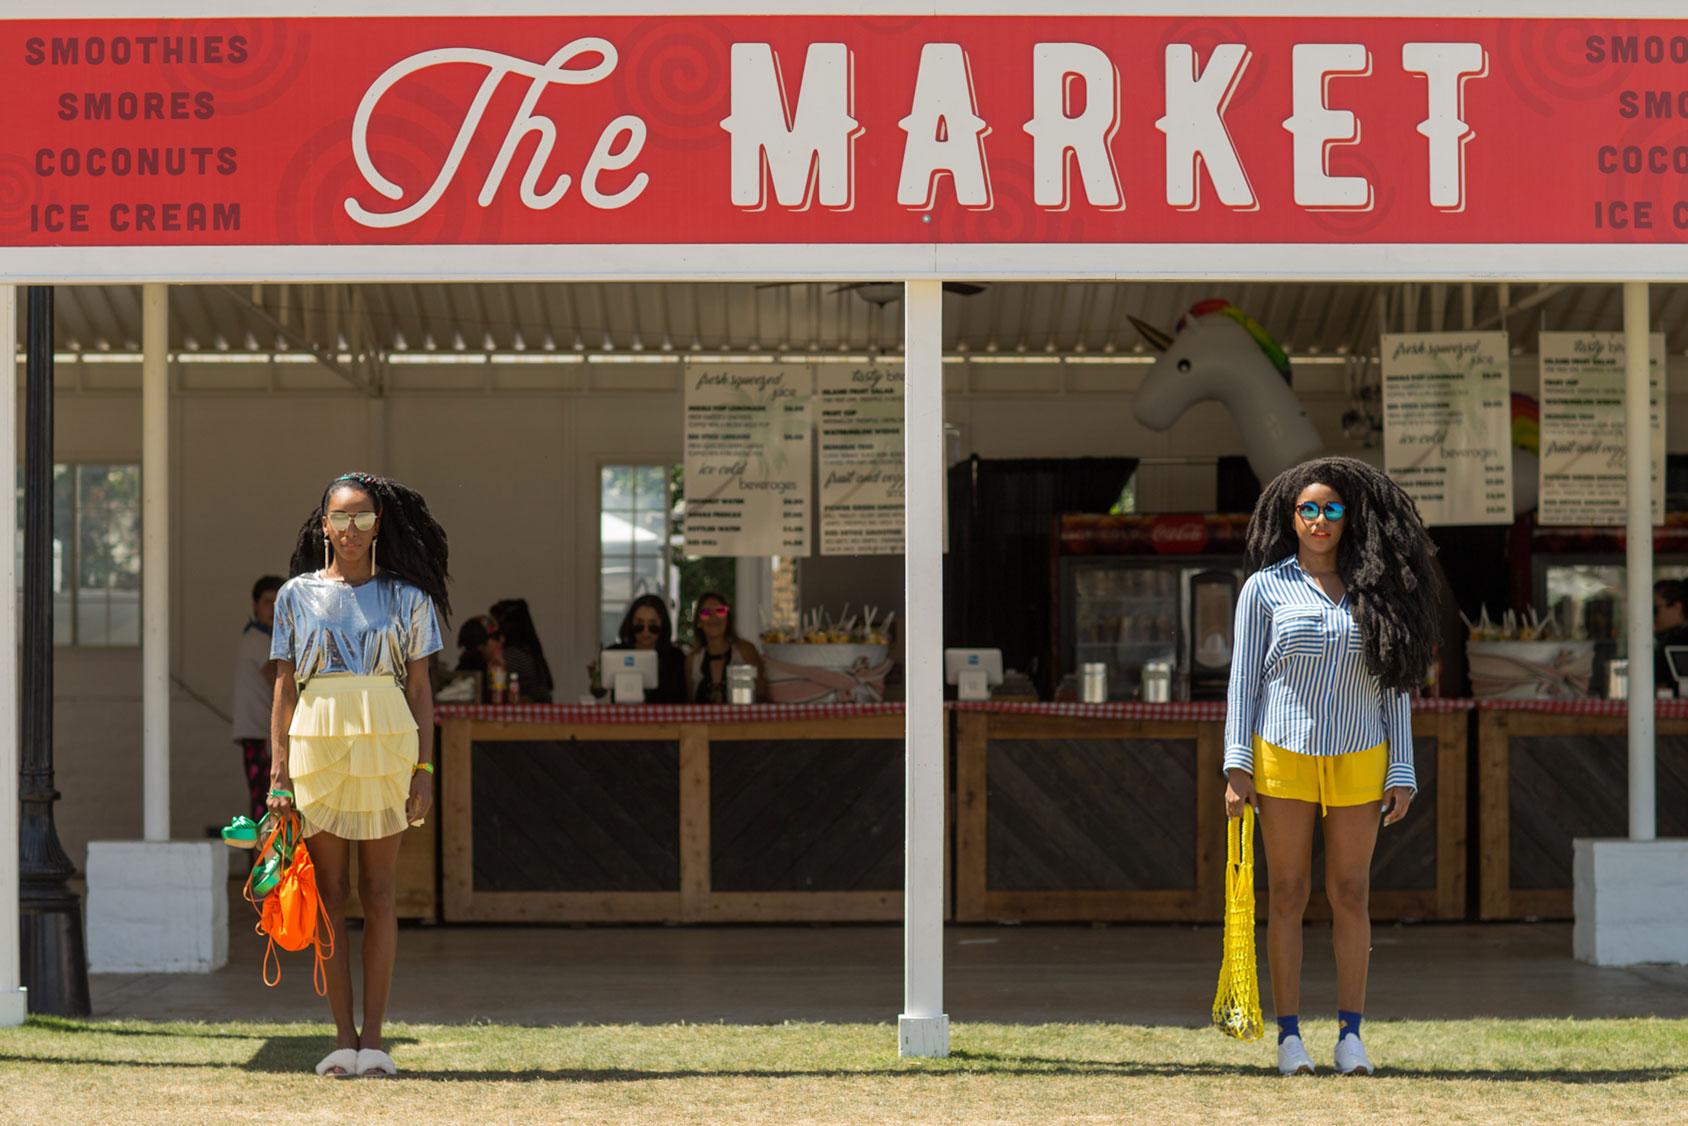 Cipriana(左)身着H&M金属质感上衣、褶边裙,搭配人造革平底鞋。 TK的短裤、上衣与鞋子属于H&M春季系列,包包是用回收海岸废物制成,属于H&M的Conscious Exclusive系列。